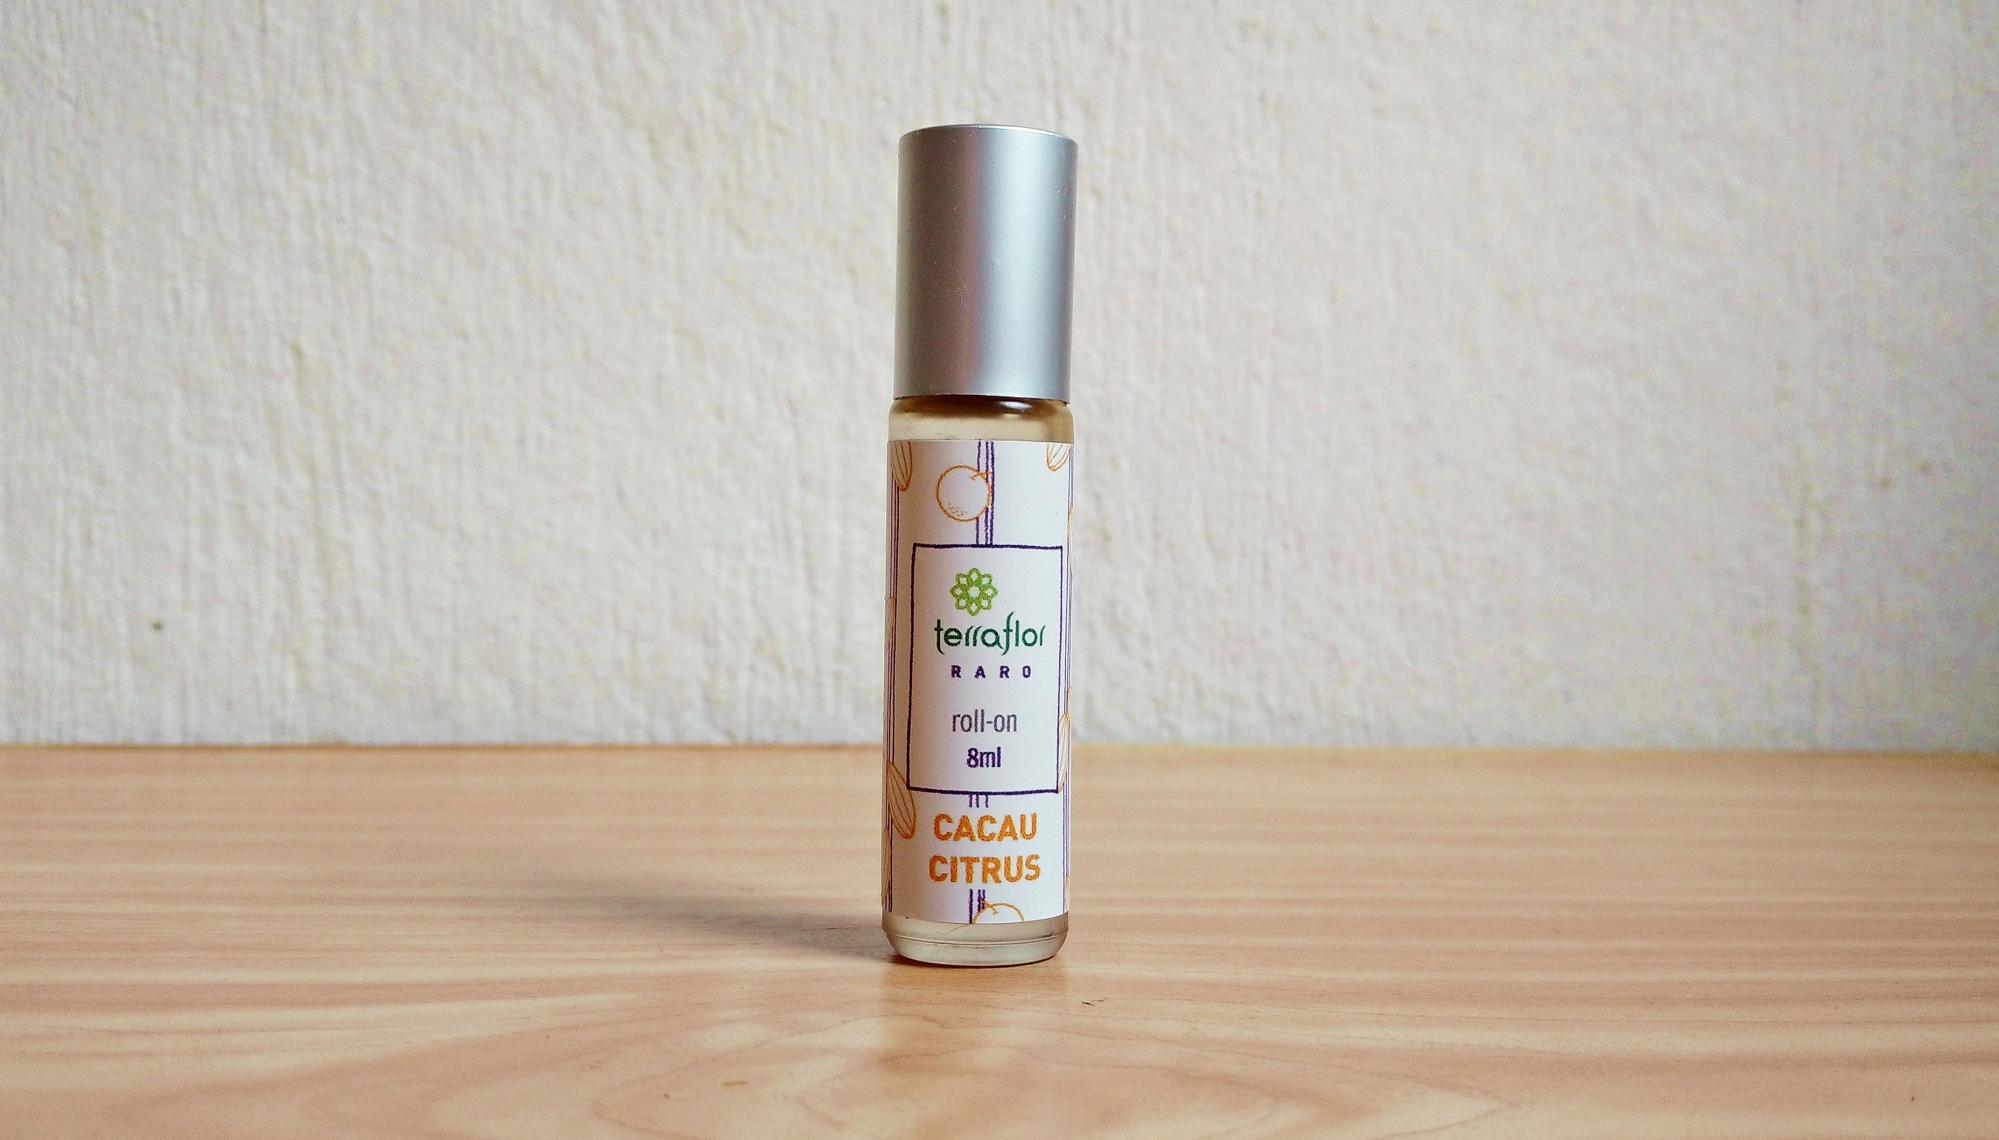 Perfume Roll-On Terra Flor Cacau Citrus